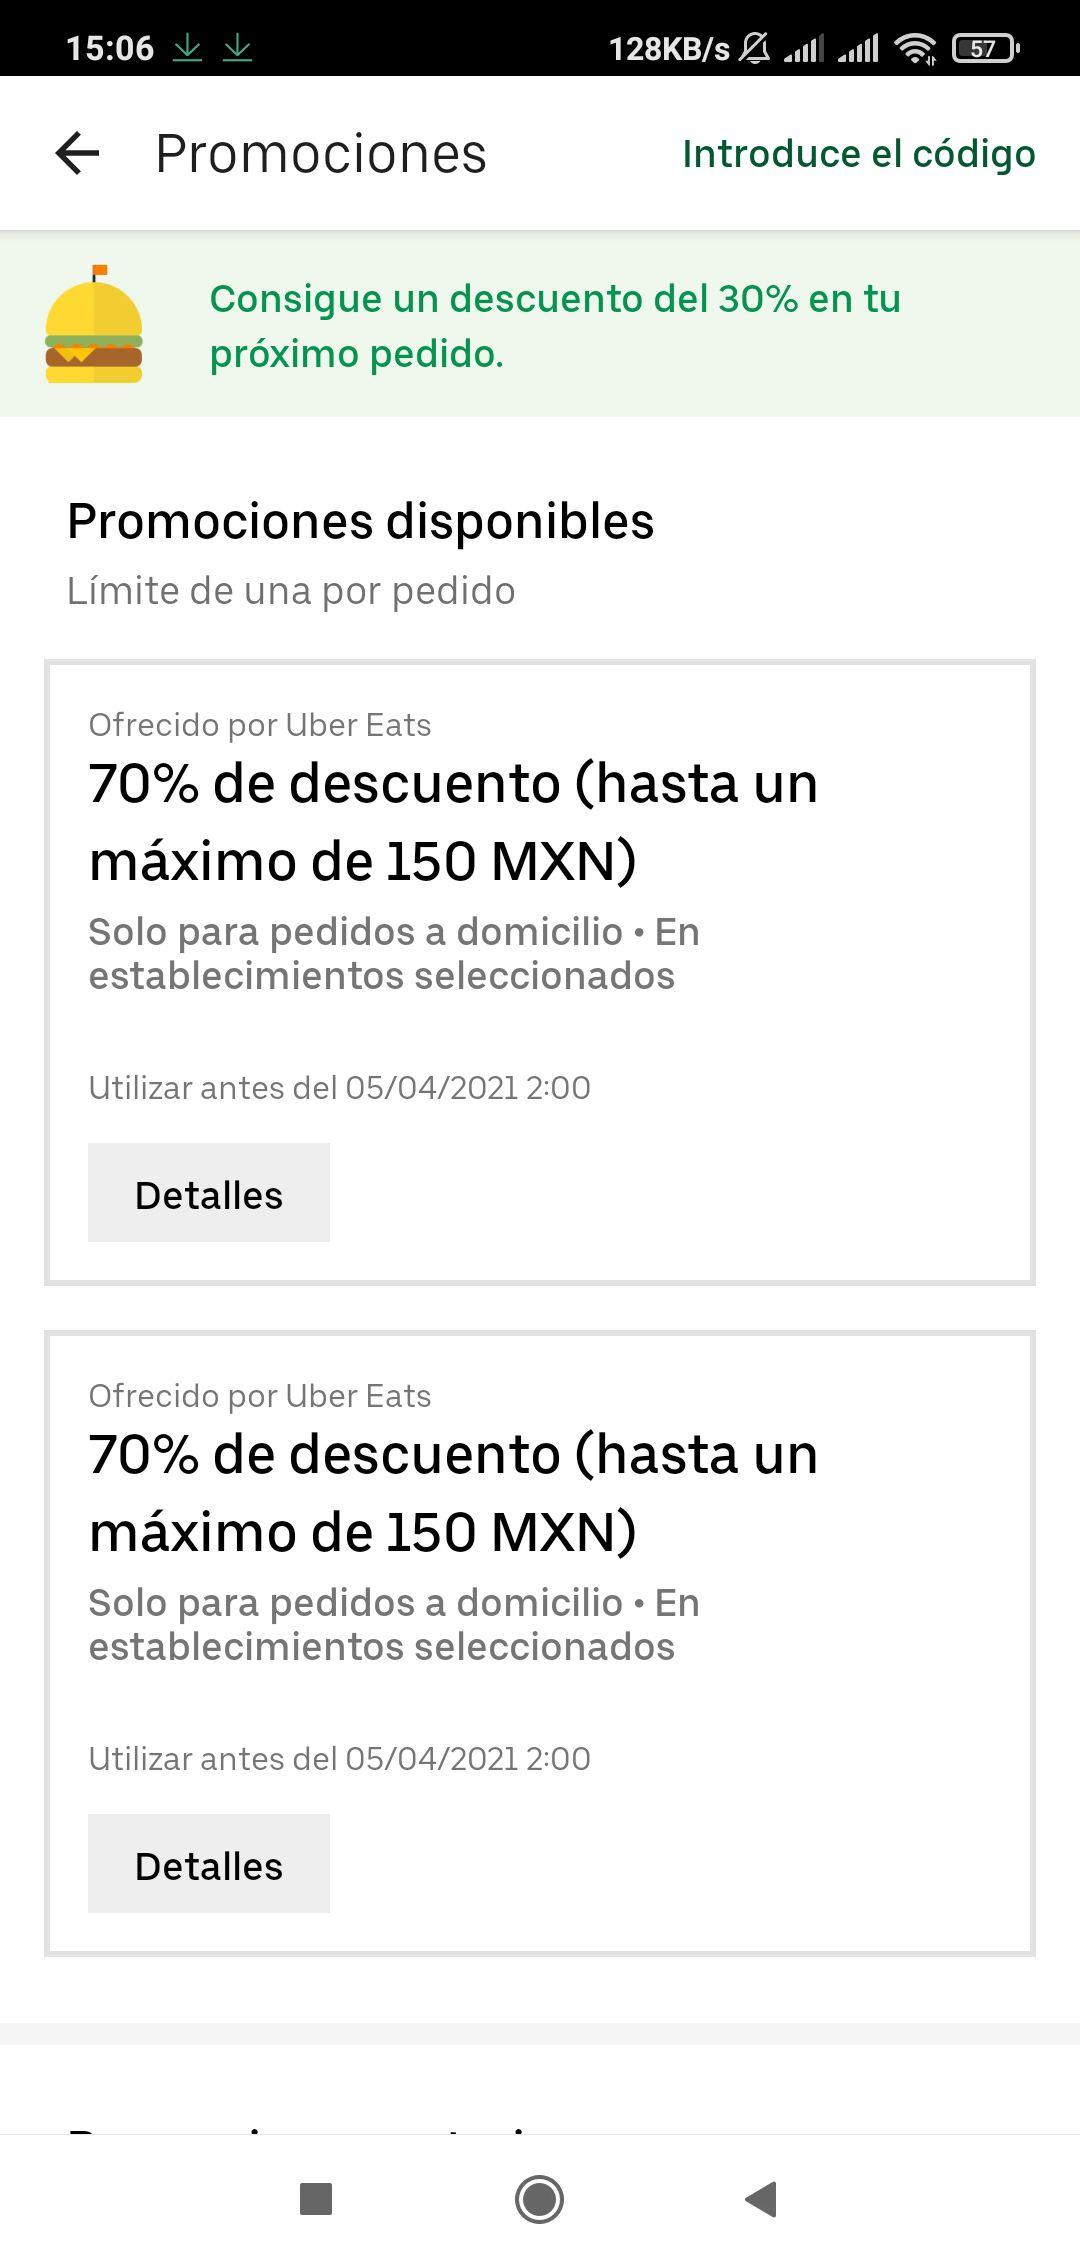 Uber Eats: 70% de descuento